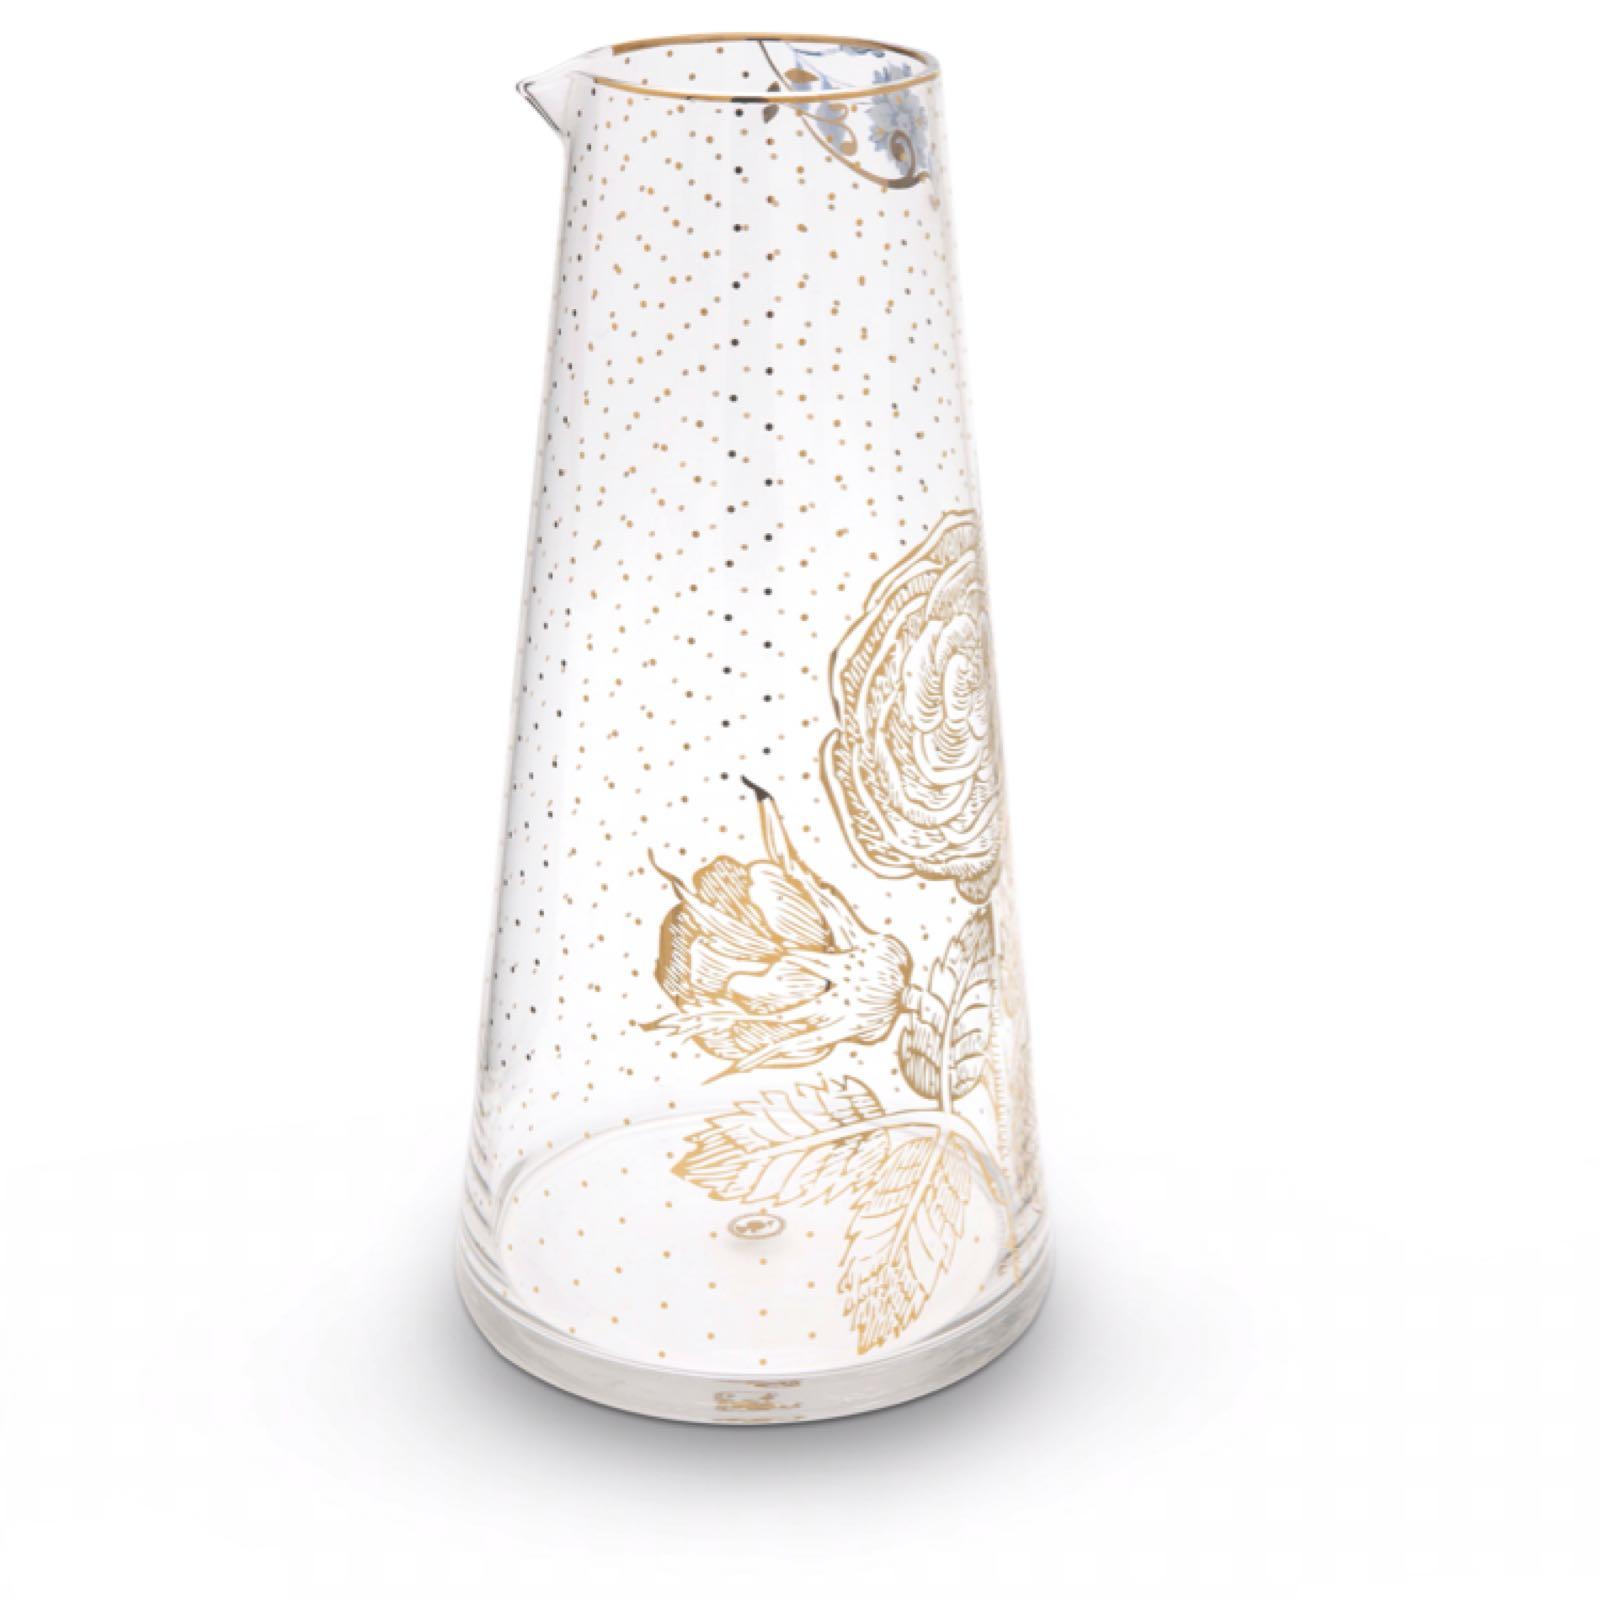 Pip studio royal golden flower pitcher